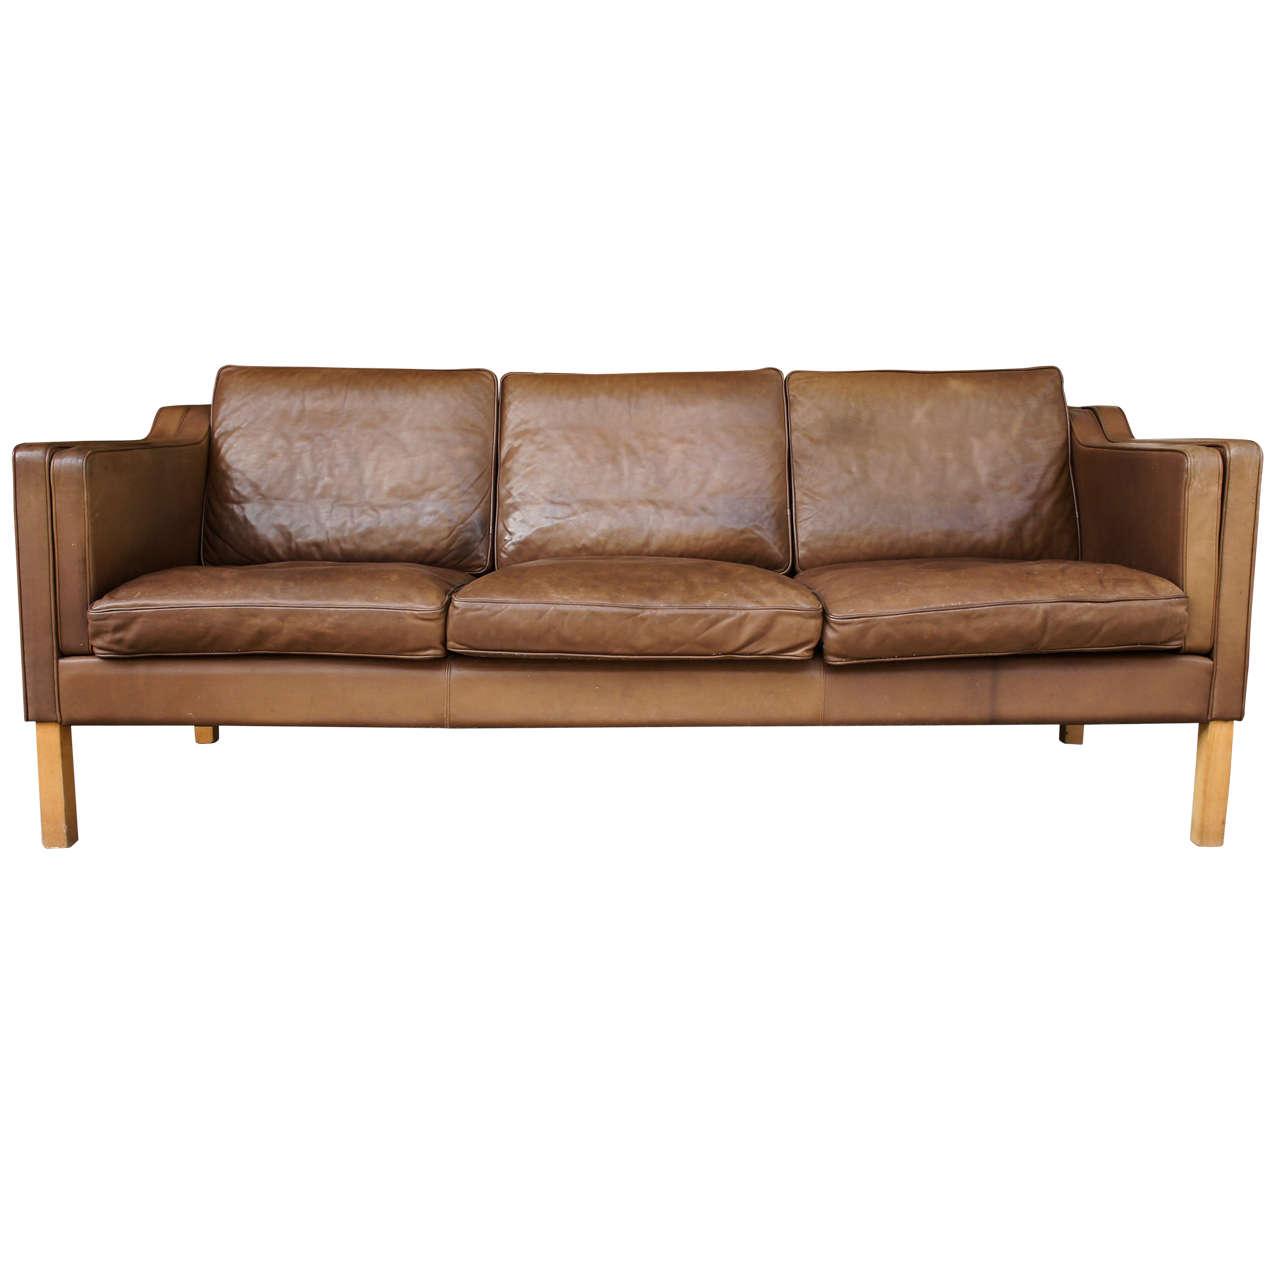 danish modern sofa leather upholstered sofa at 1stdibs